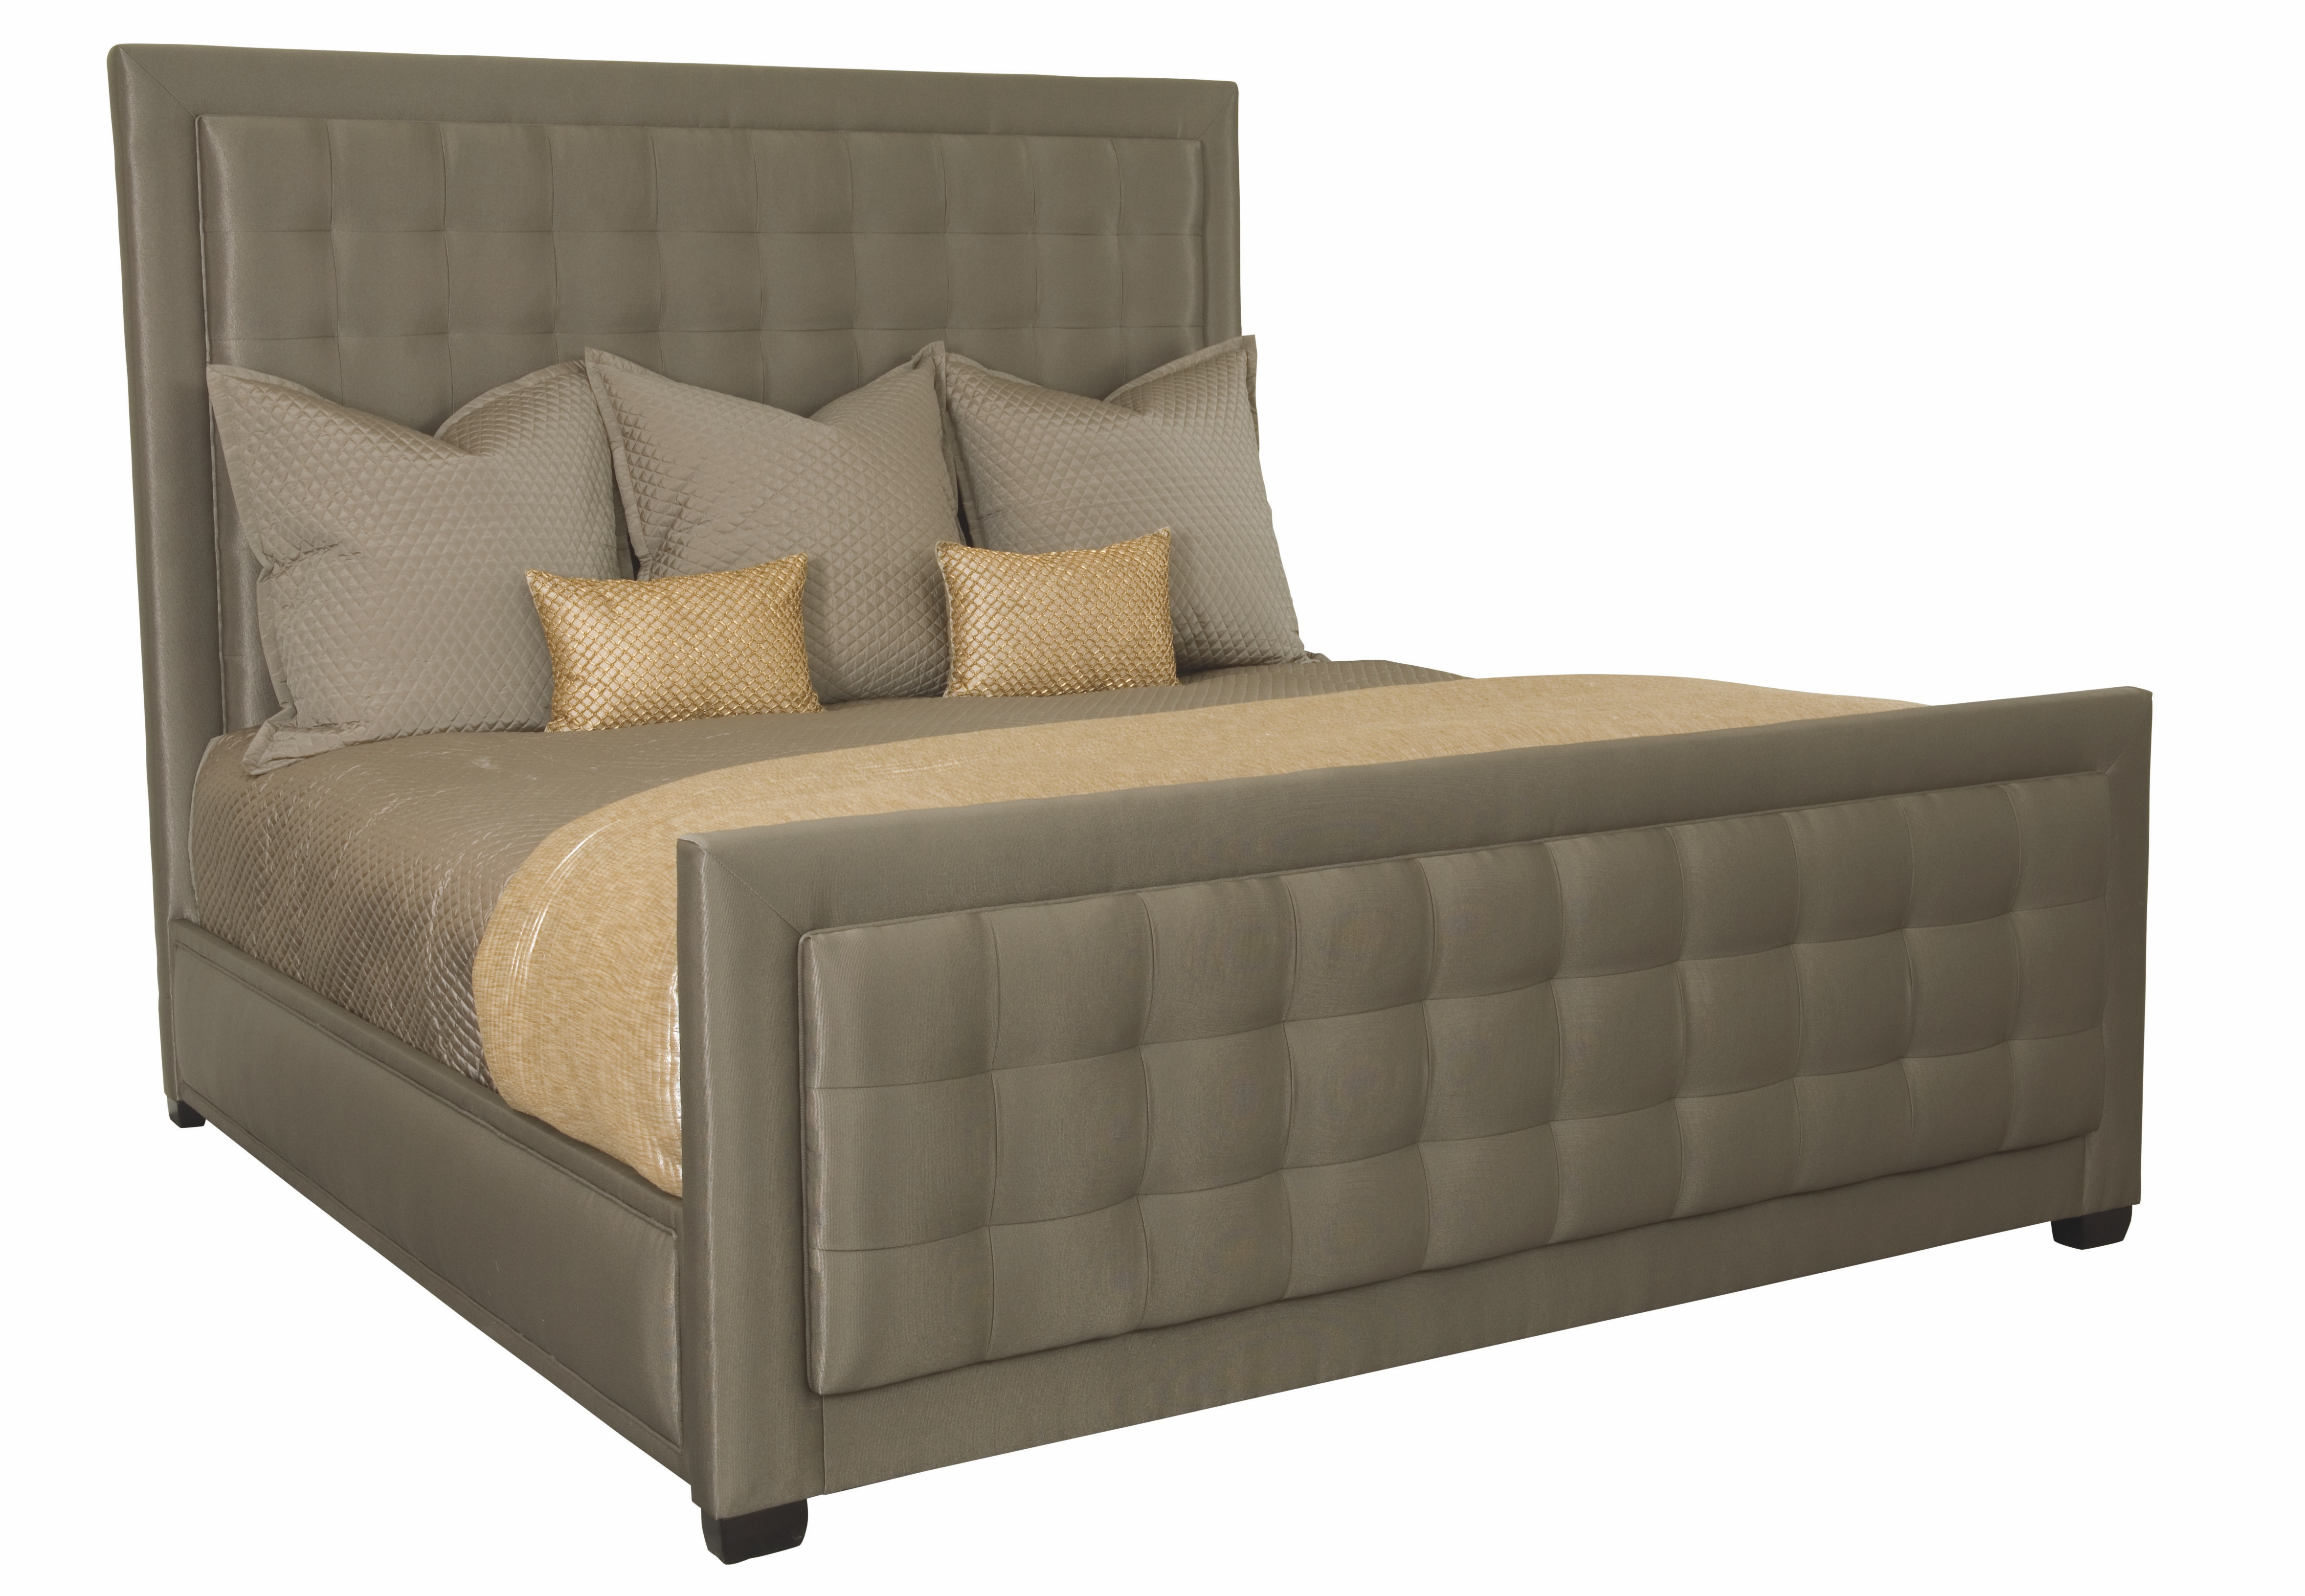 Bernhardt Interiors Jet Set Upholstered Bed 356 HFR09